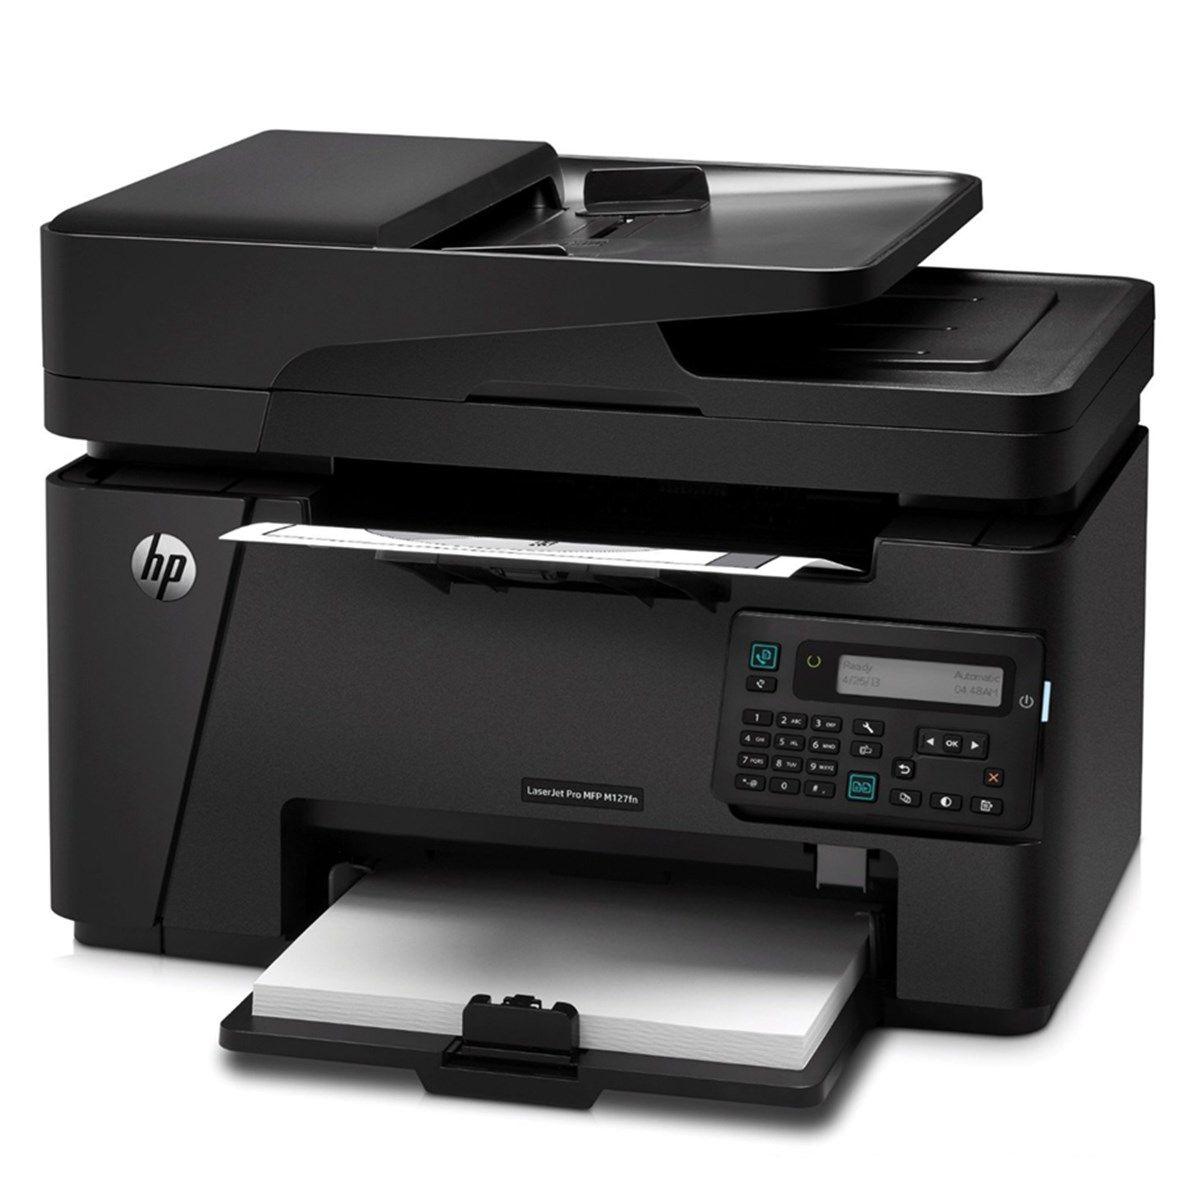 Impressora Hp M127fn M127 Cz181a Laser Pro Multifuncional